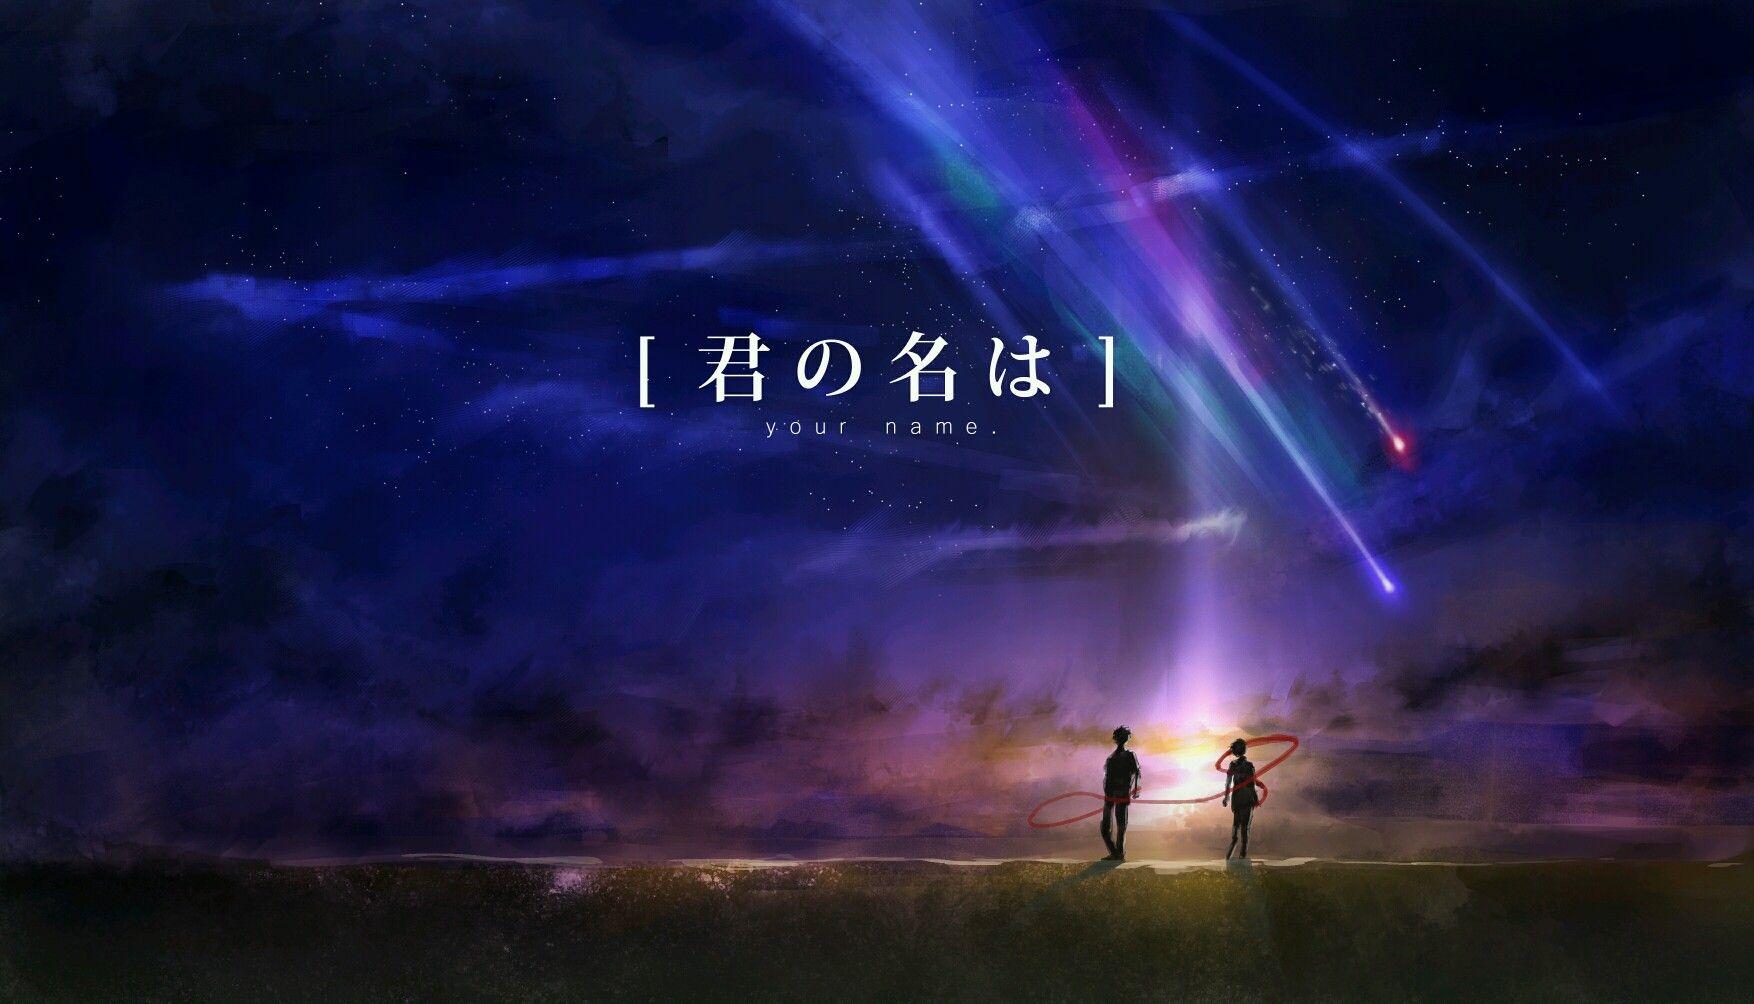 Pin by Chloe love anime on Kimi no na wa Your name